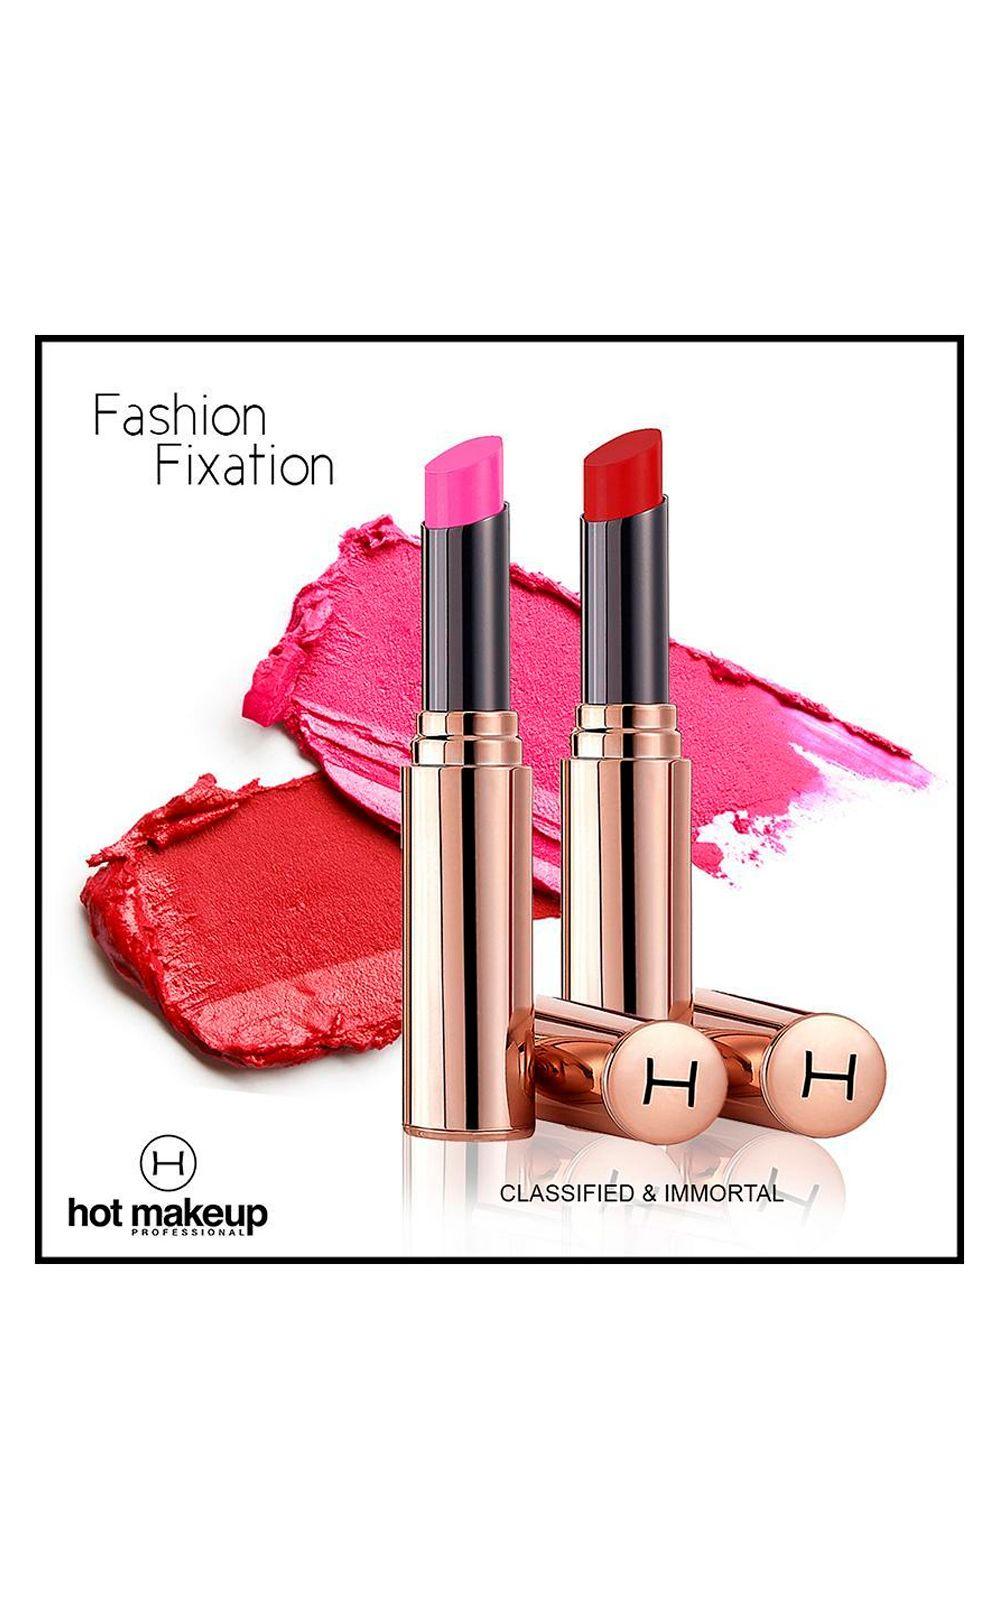 Foto 4 - Red Carpet Hot Makeup - Batom - RCL09 - Dim the Light